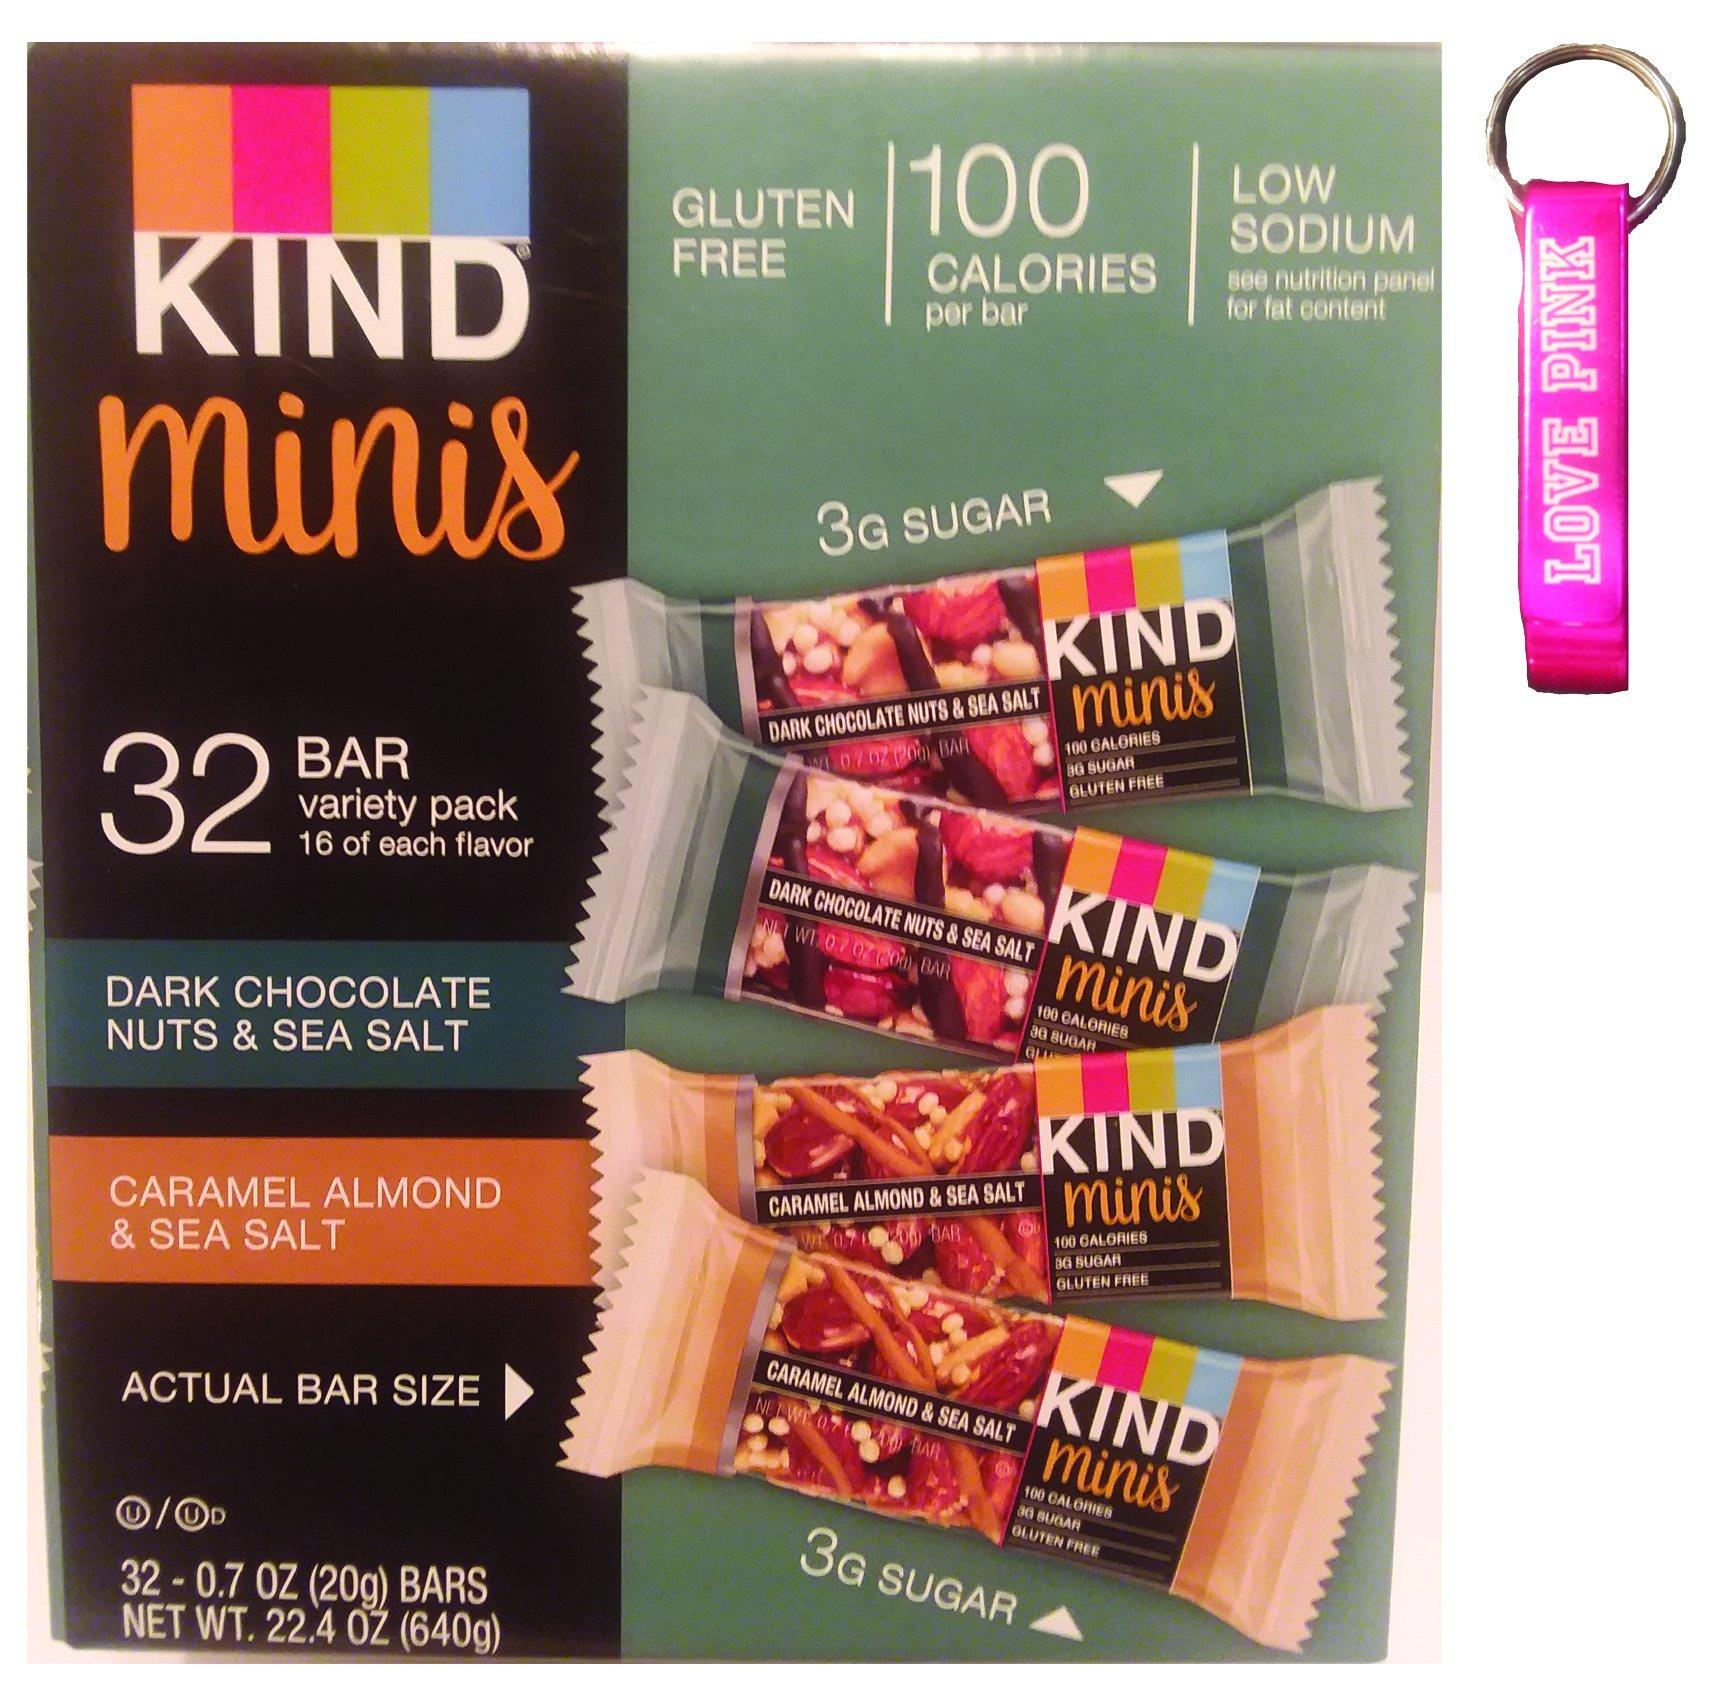 Kind mini's 32 bar variety pack. Dark Chocolate Nuts & Sea Salt, Caramel Almond & Sea Salt. 16 of each flavor, 0.7 oz bars & Pink Bottle Opener